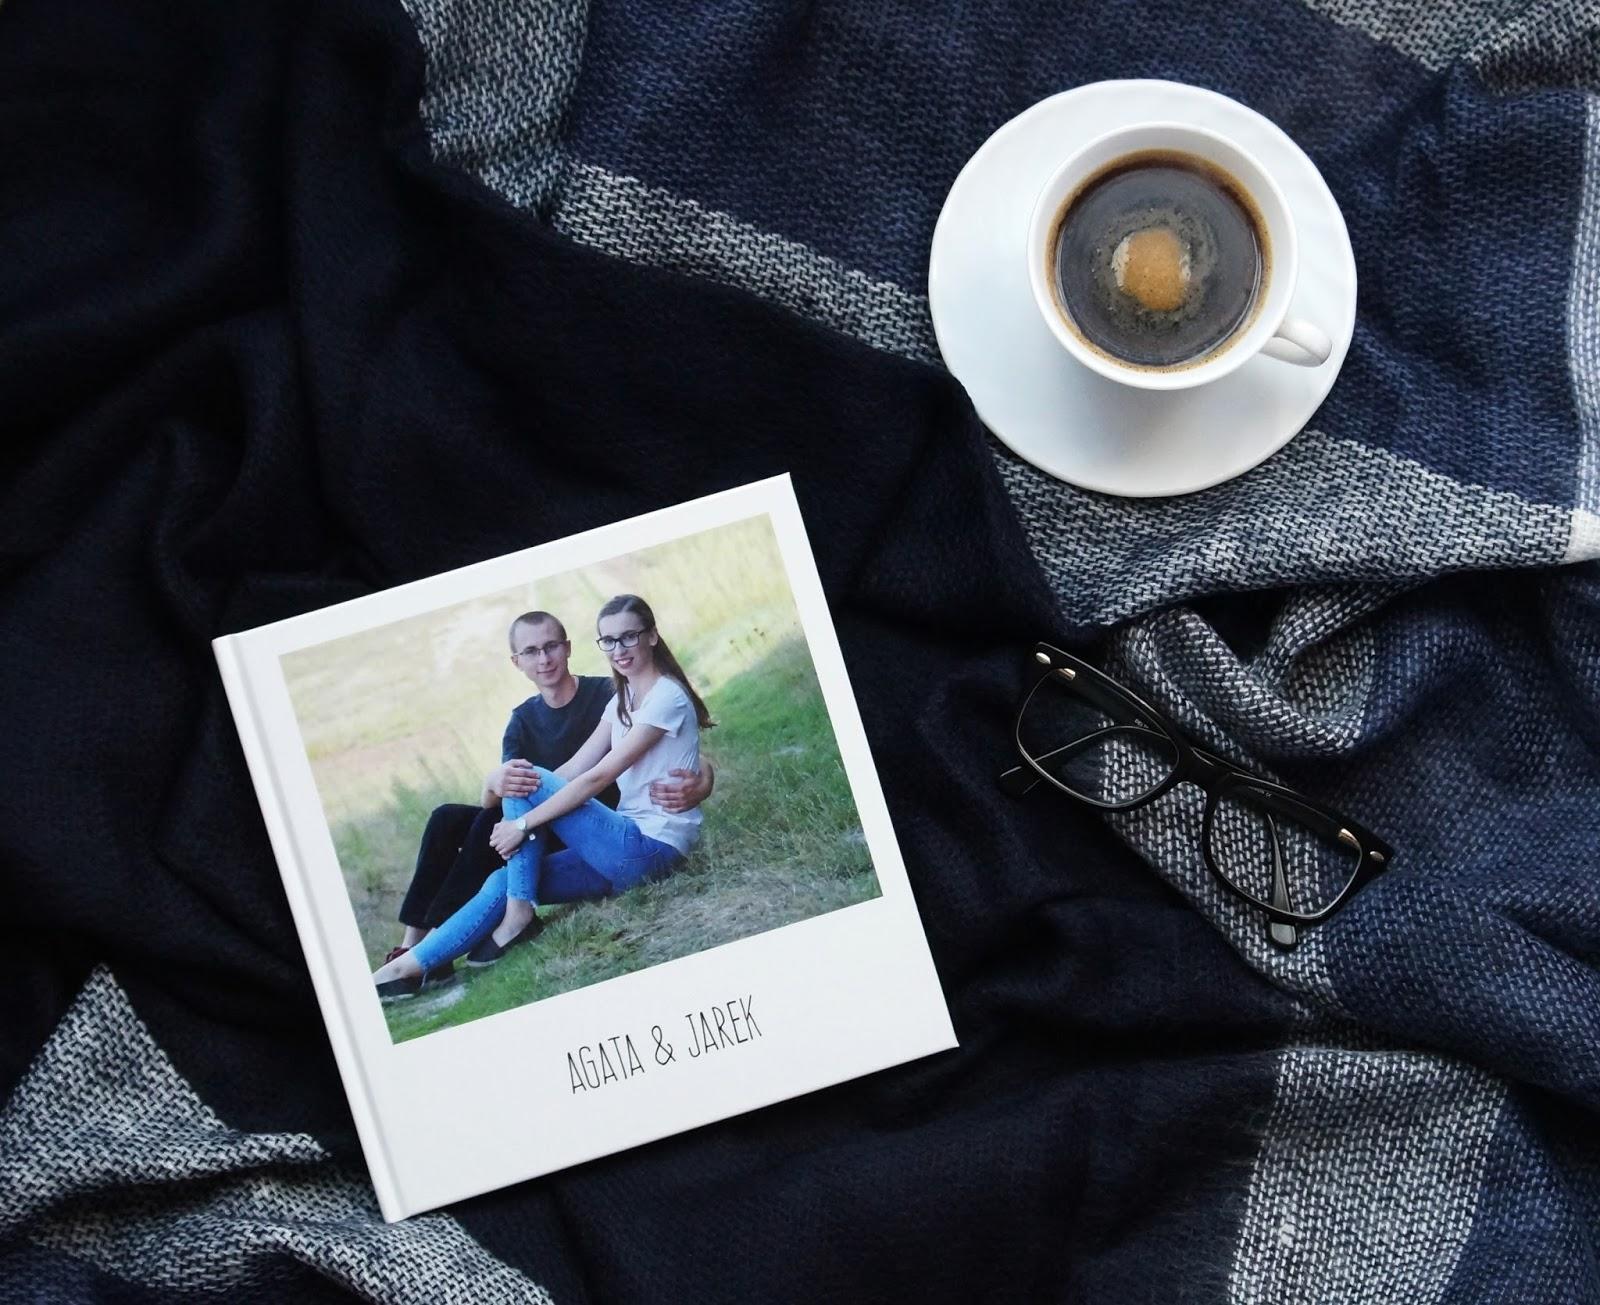 Utrwalić wspomnienia - fotoksiążka Saal Digital